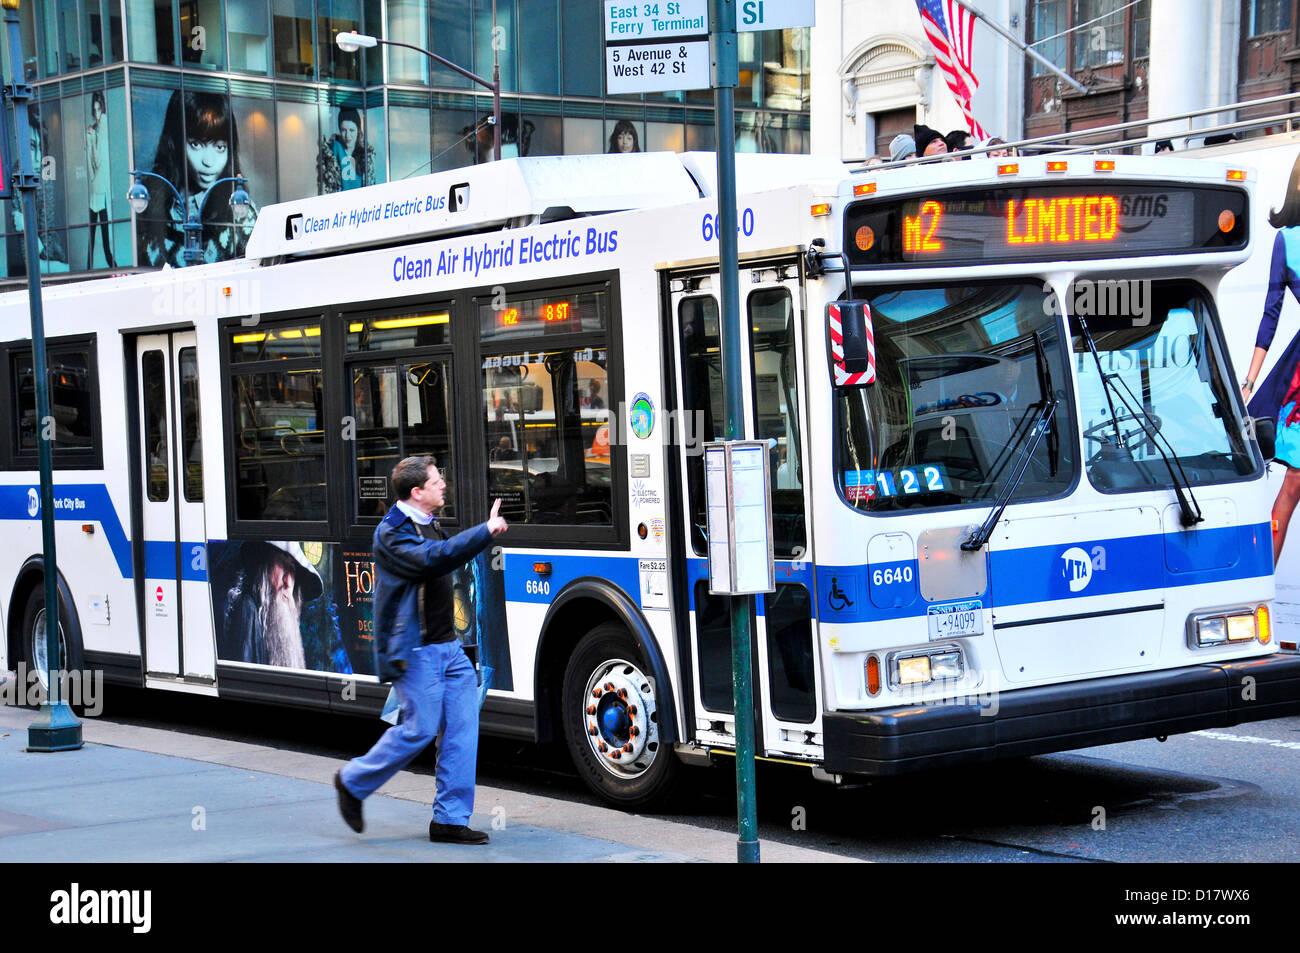 New York City Public Transportation M2 Bus, Manhattan, New York City, USA - Stock Image